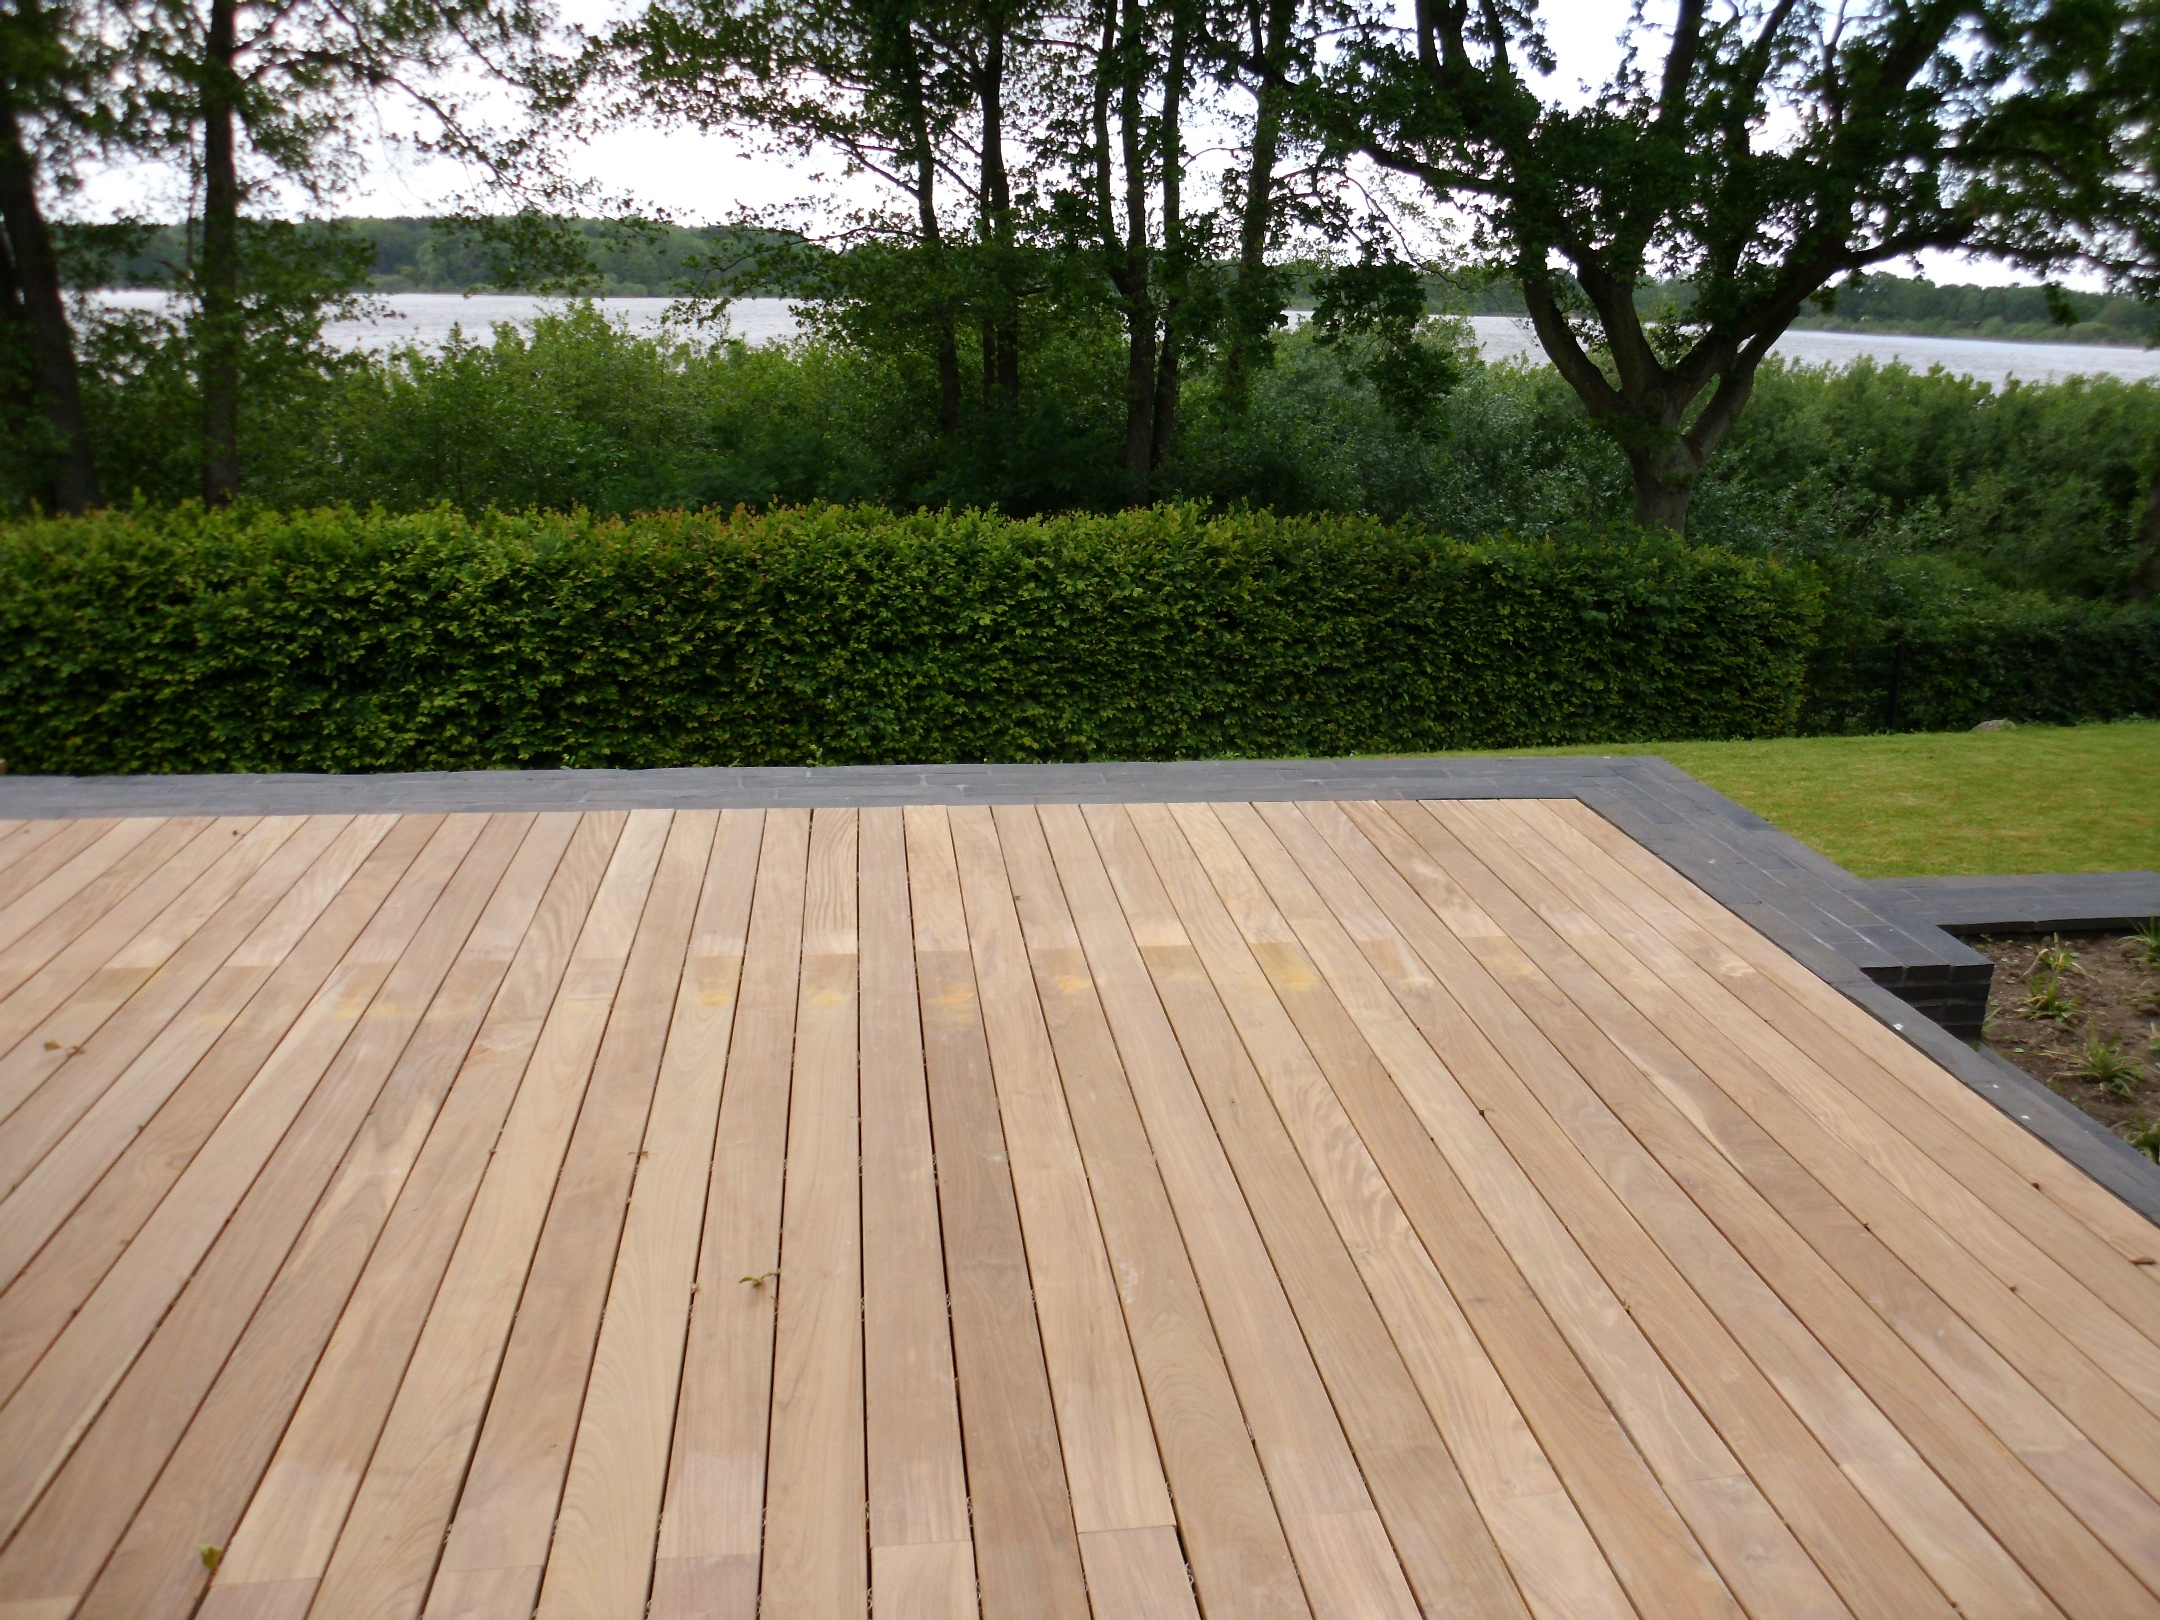 Terrasse natur Holz modern